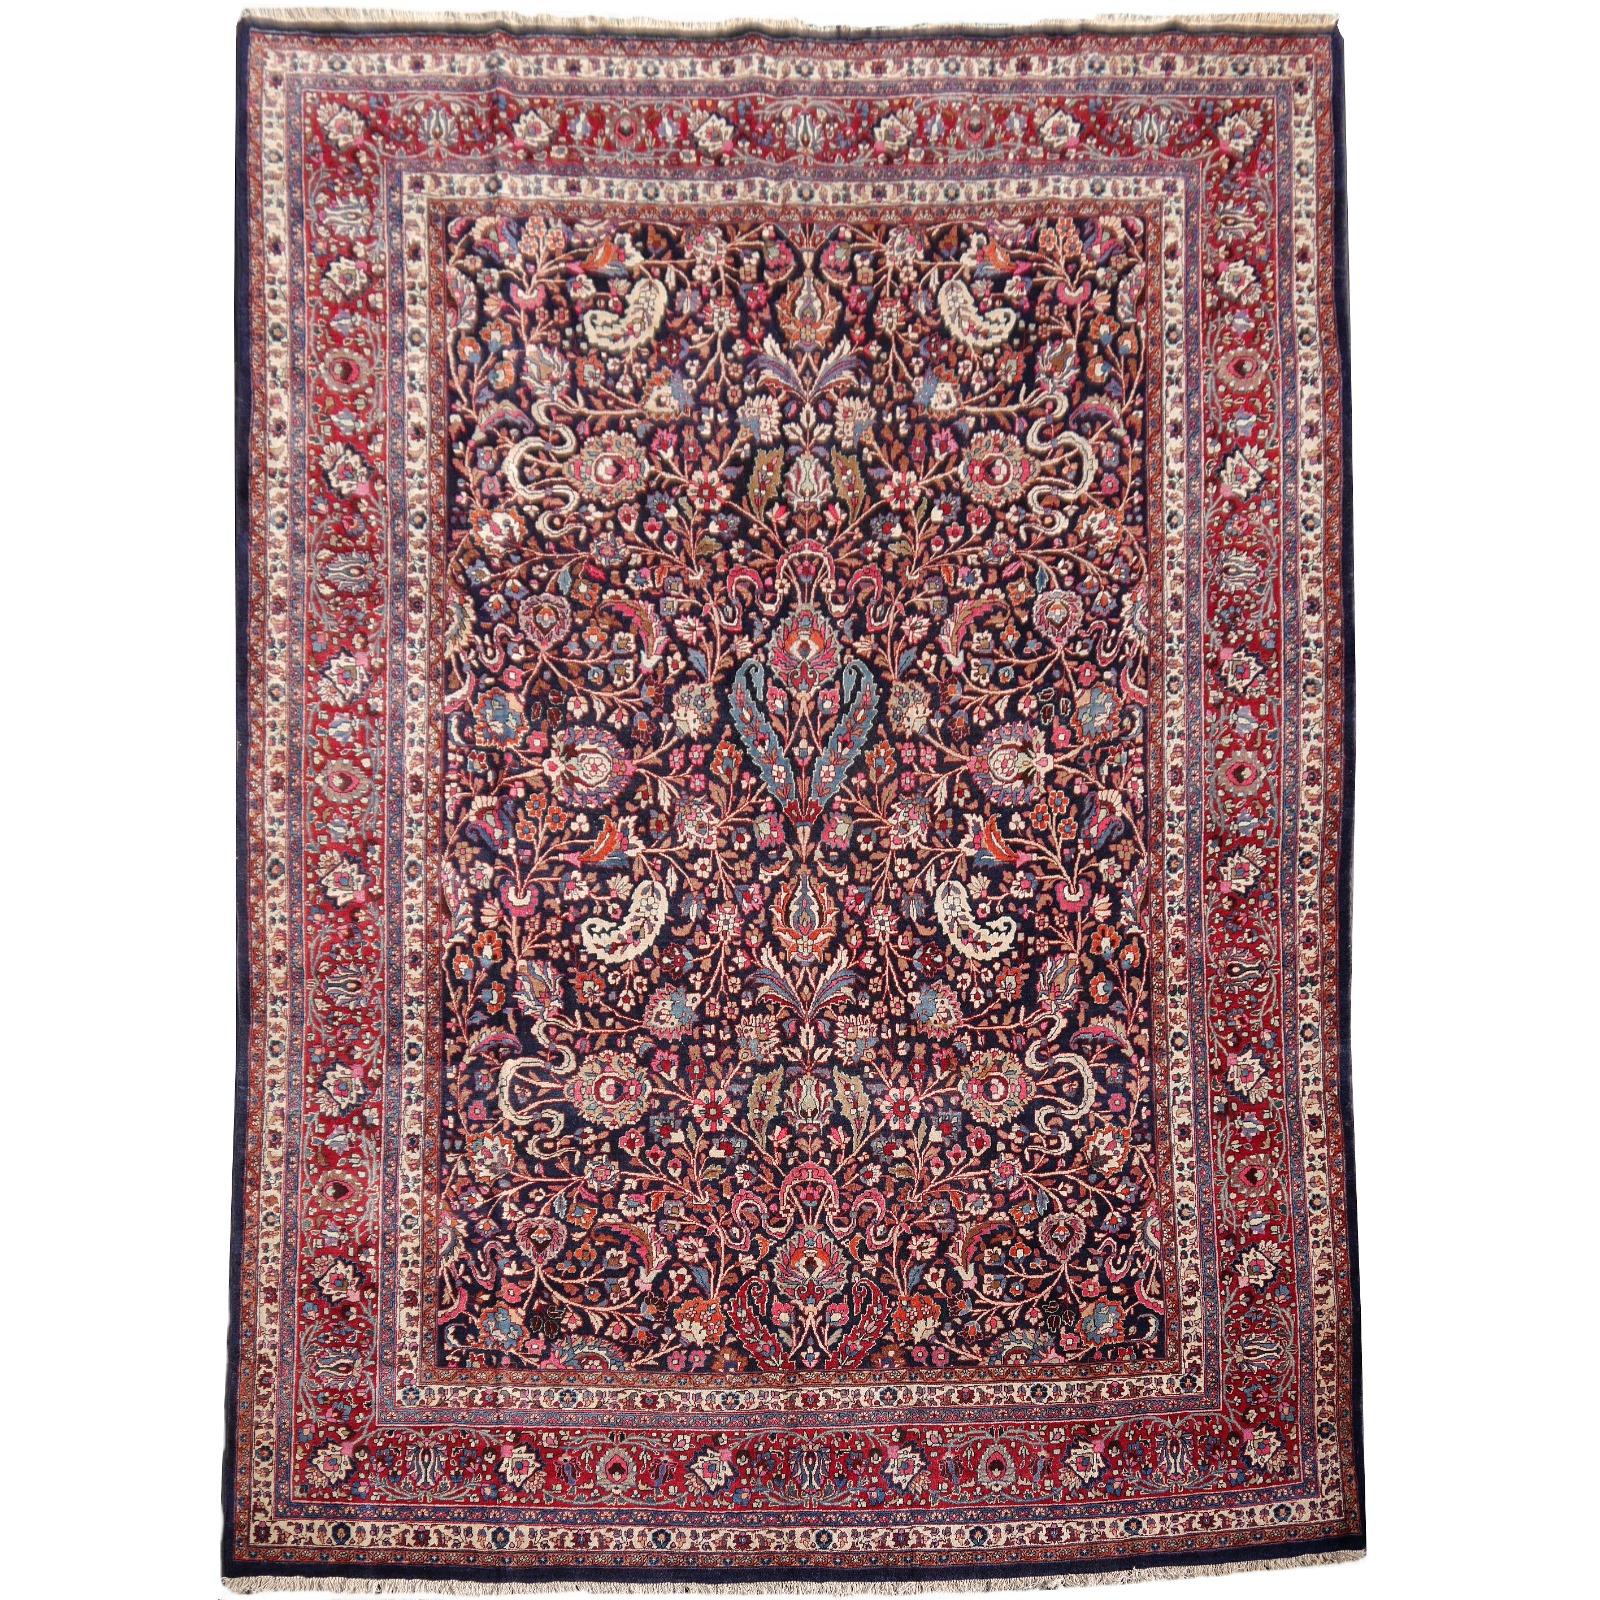 14324 mesched alt teppich iran persien 403 x 305 cm. Black Bedroom Furniture Sets. Home Design Ideas